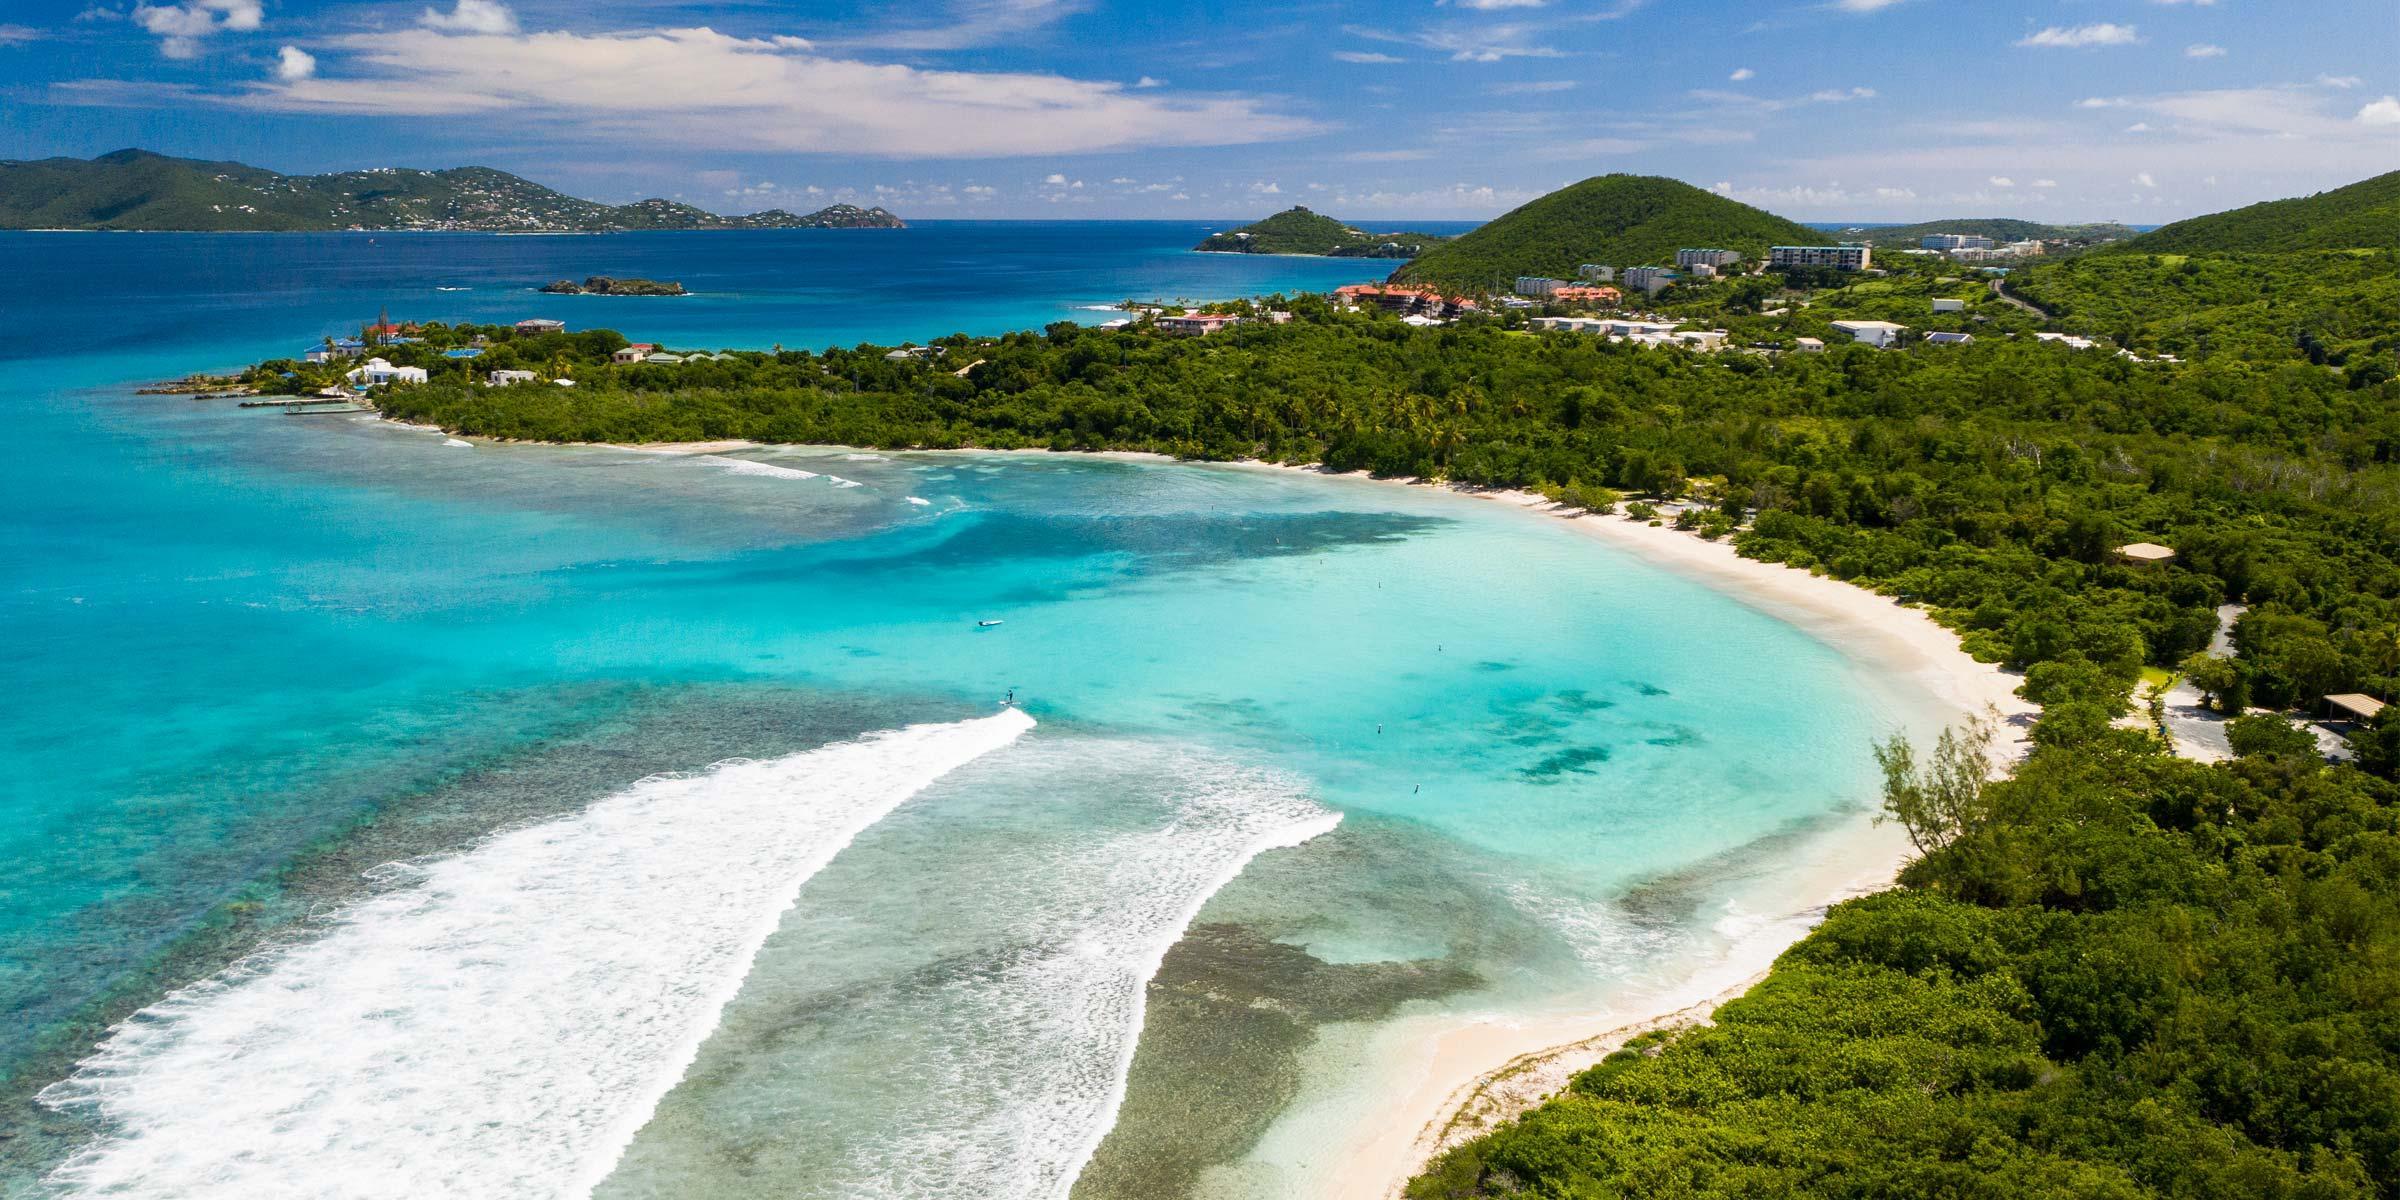 Lindquist Beach on St. Thomas, U.S. Virgin Islands